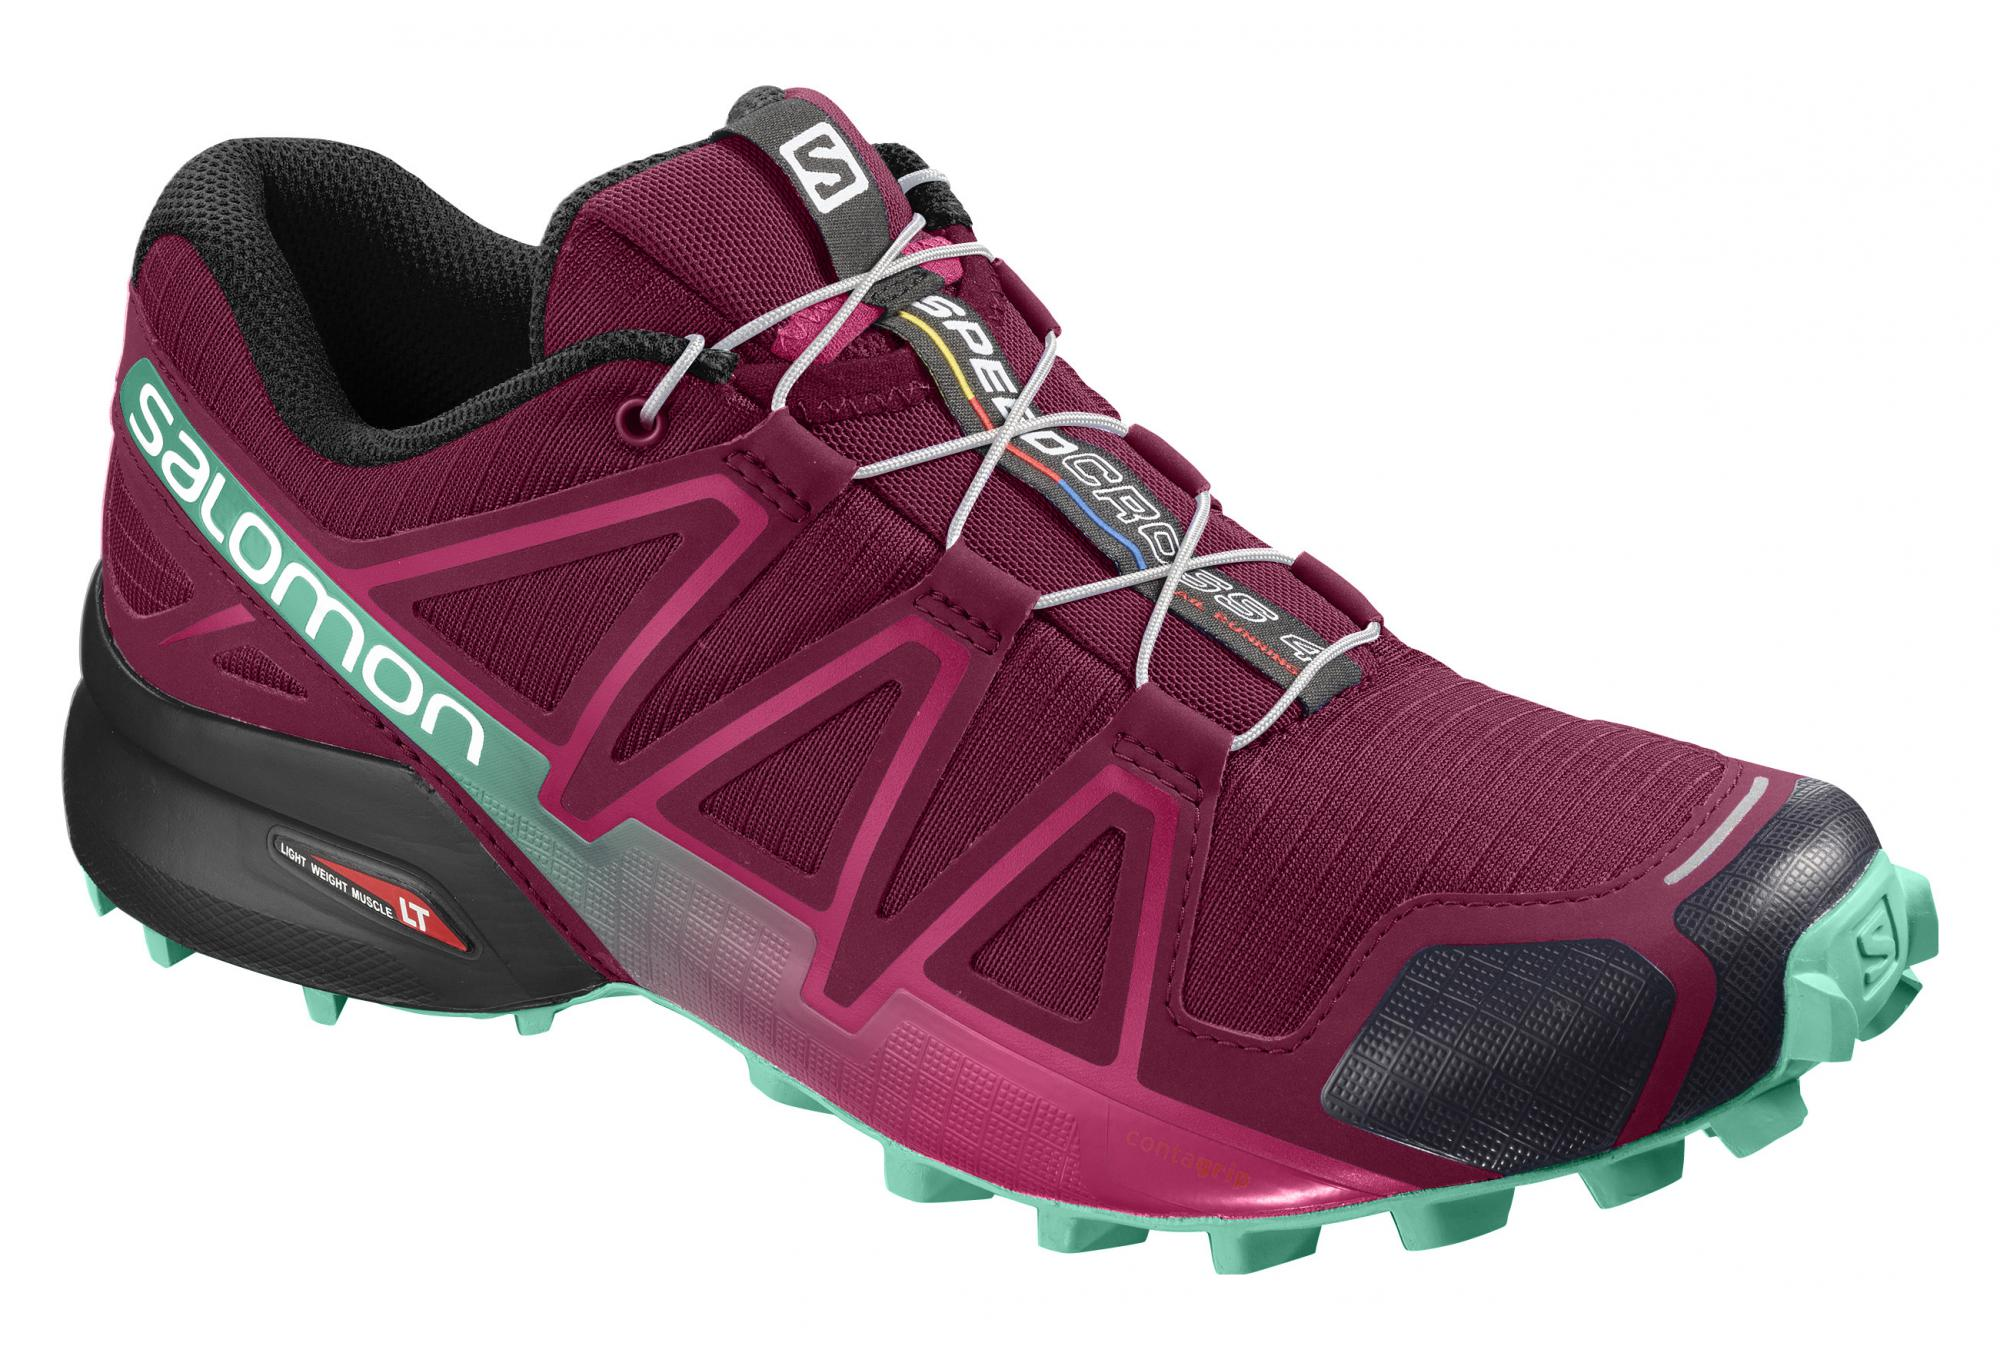 Chaussures de Trail Femme Salomon Speedcross 4 Violet Bleu